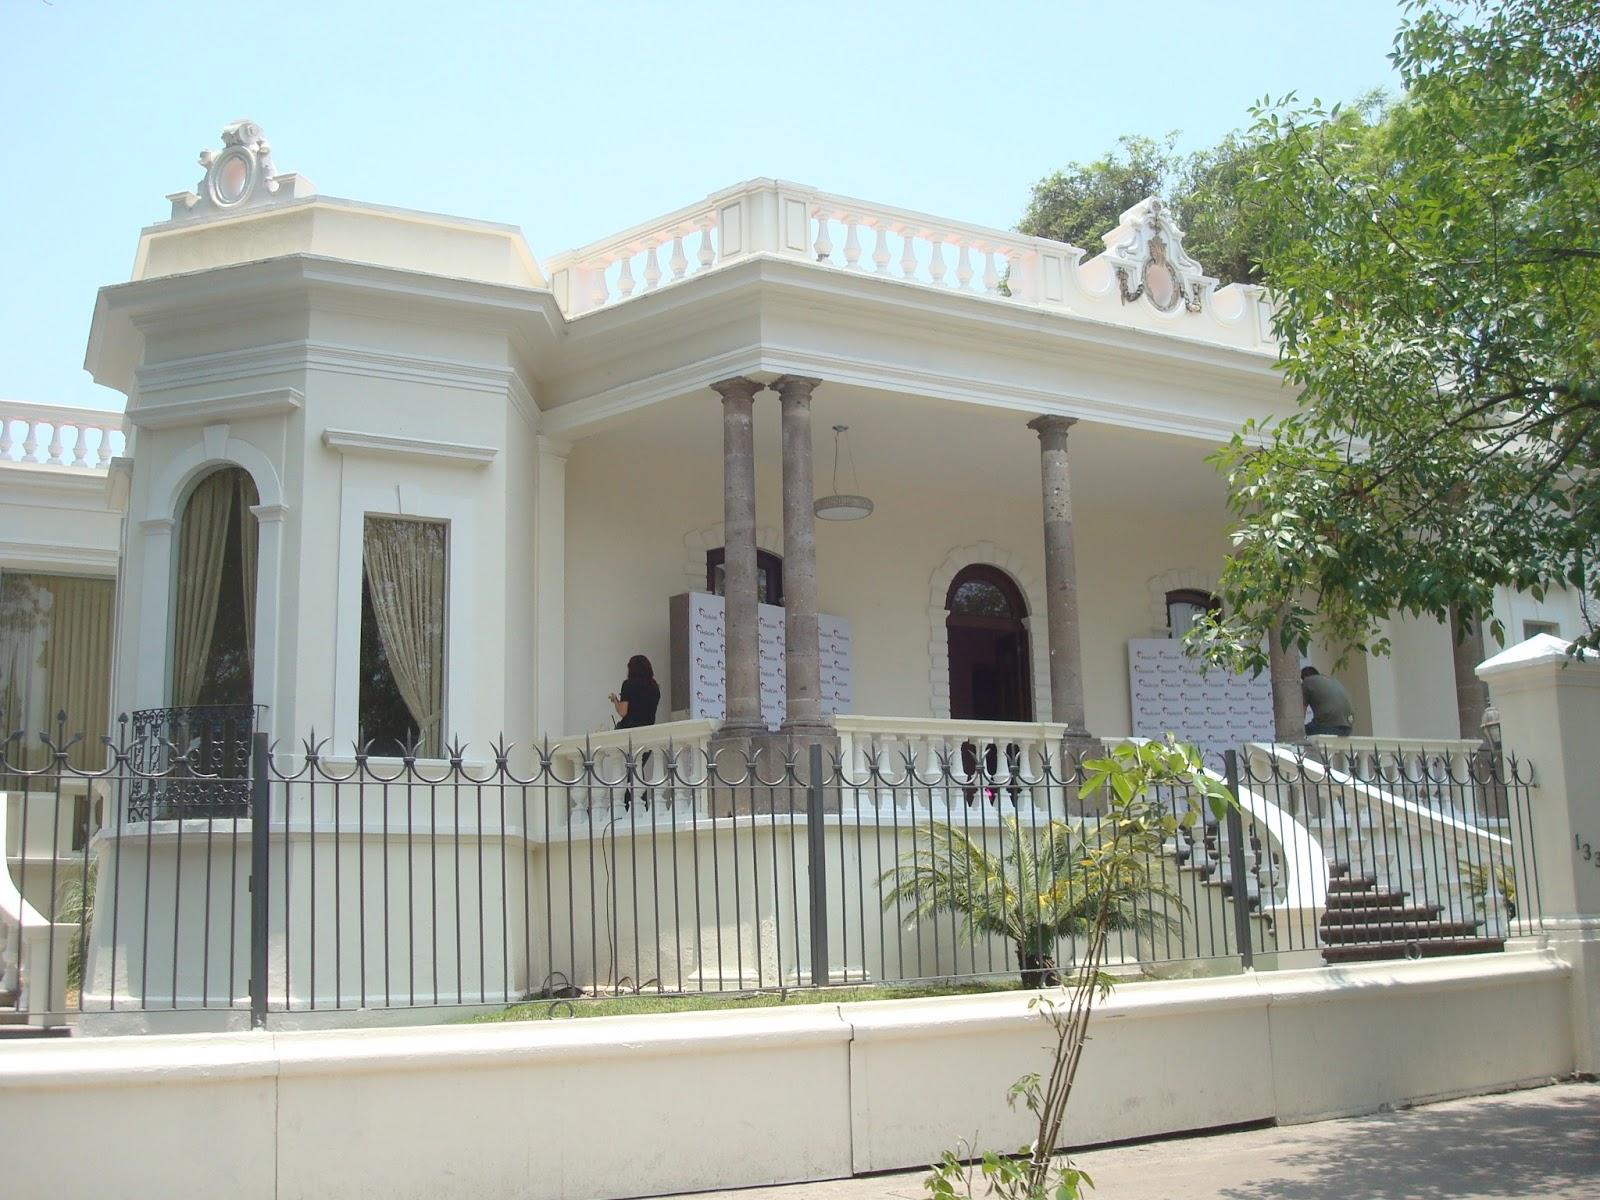 Sancarlosfortin casas antiguas de la avenida vallarta en for Casas viejas remodeladas